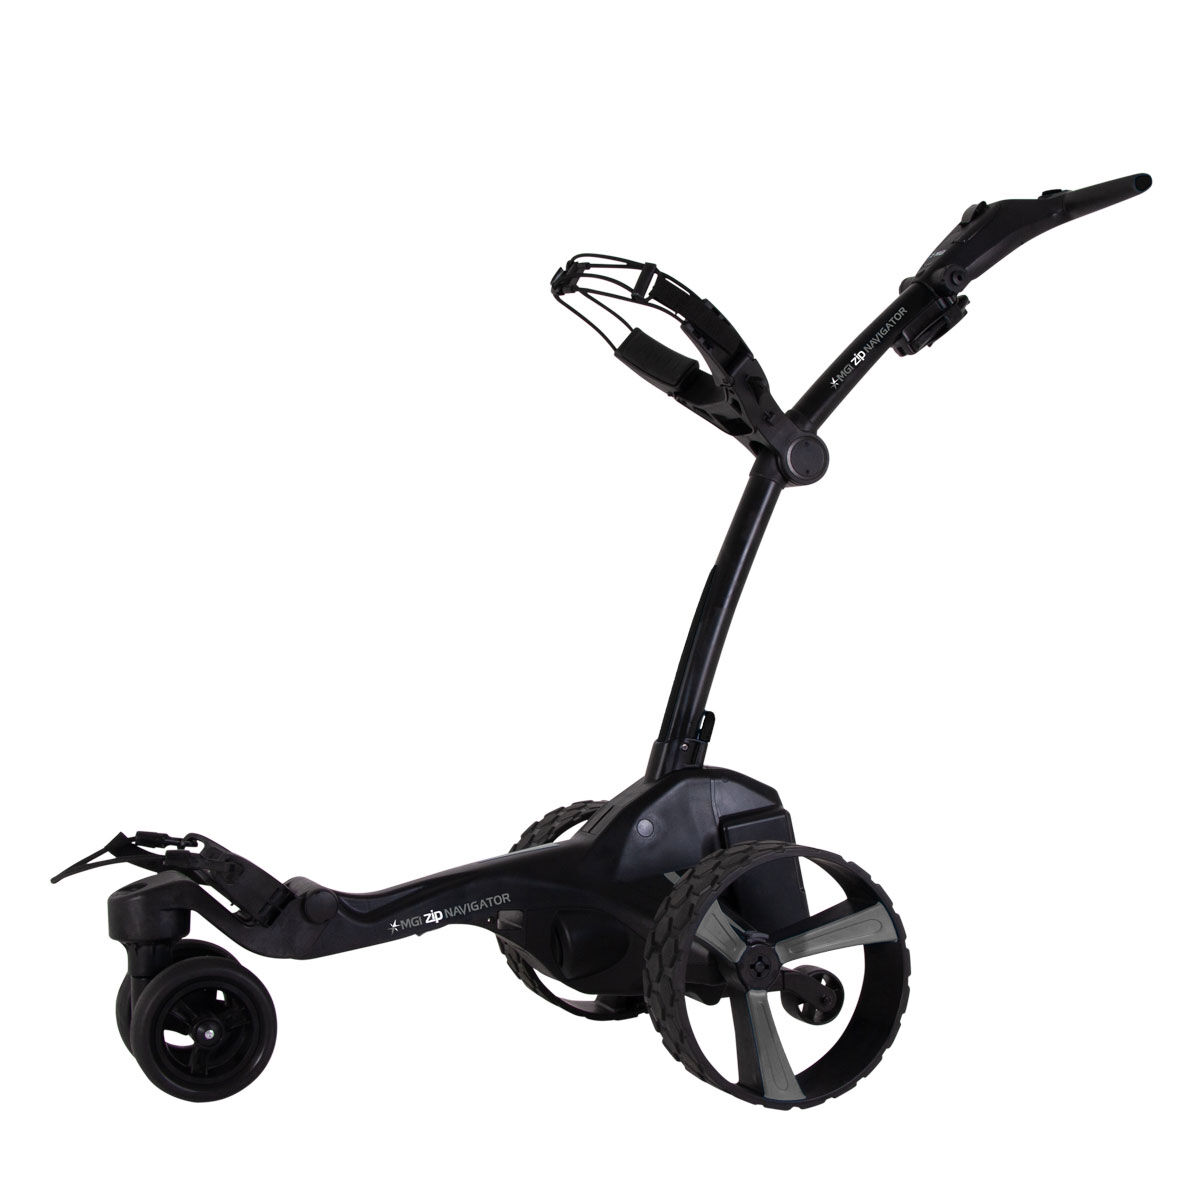 "MGI Golf Black Zip Navigator Remote Control Lithium Electric Golf Trolley, Size: 27.55x18.5x16.5""   American Golf   American Golf"